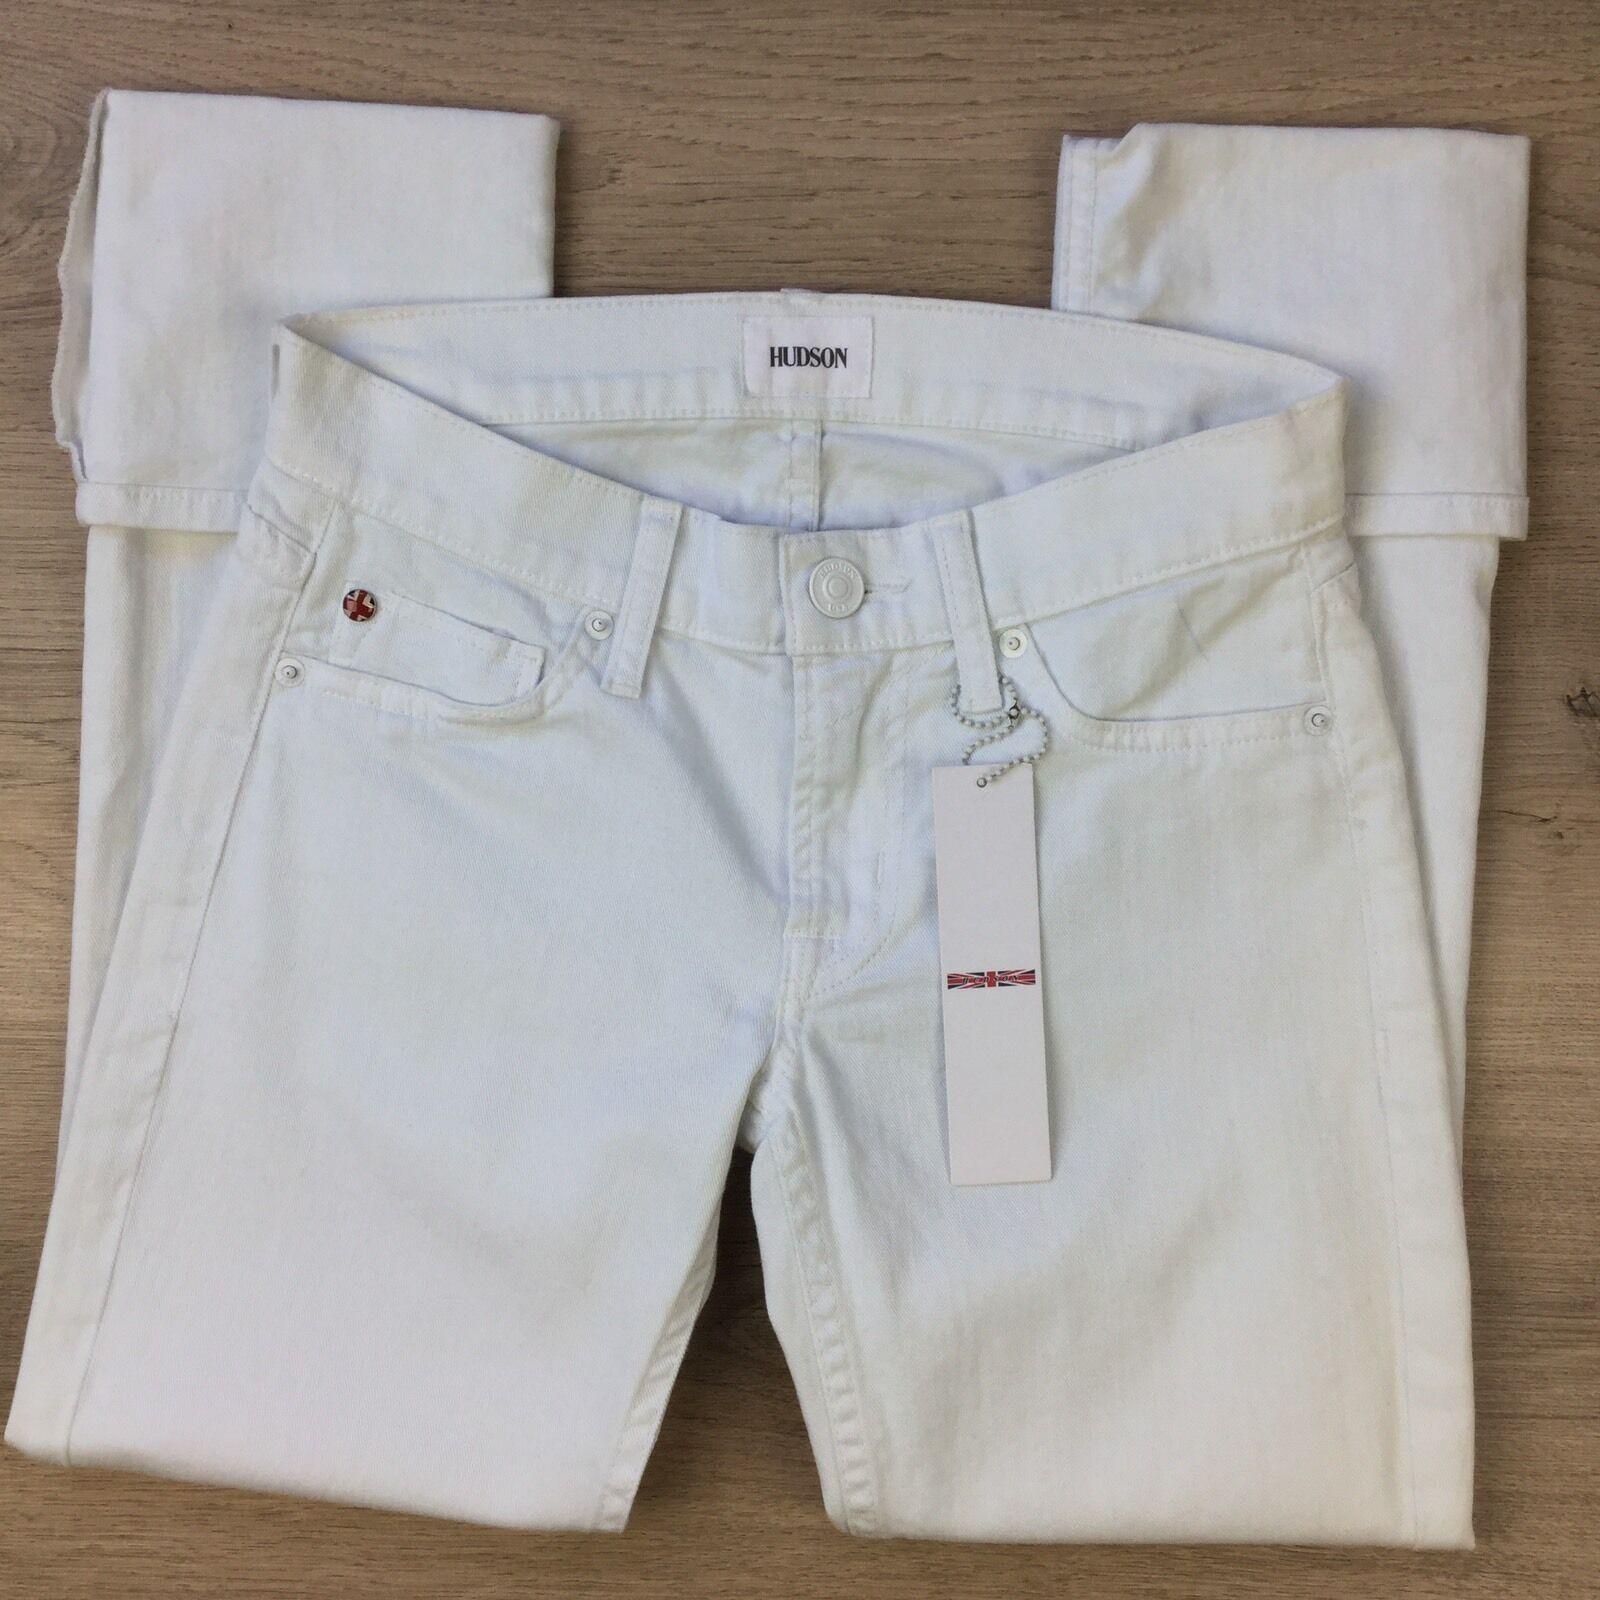 Hudson Muse Crop Skinny w Cuff Capri Women's Jeans Size 25 NWT Made in USA (KK8)